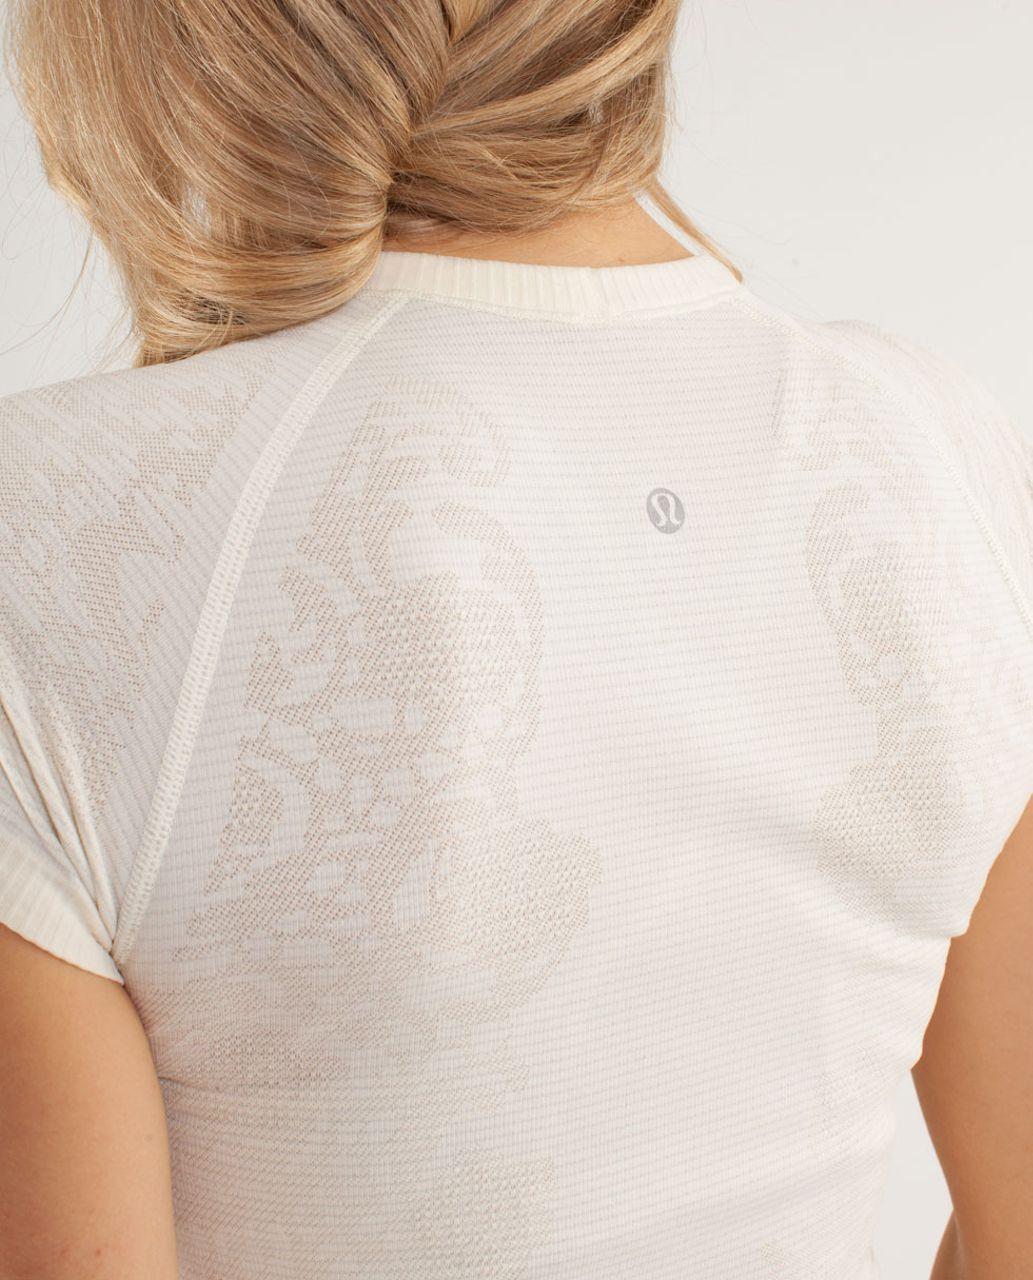 Lululemon Run:  Swiftly Tech Short Sleeve *Lace - Polar Cream